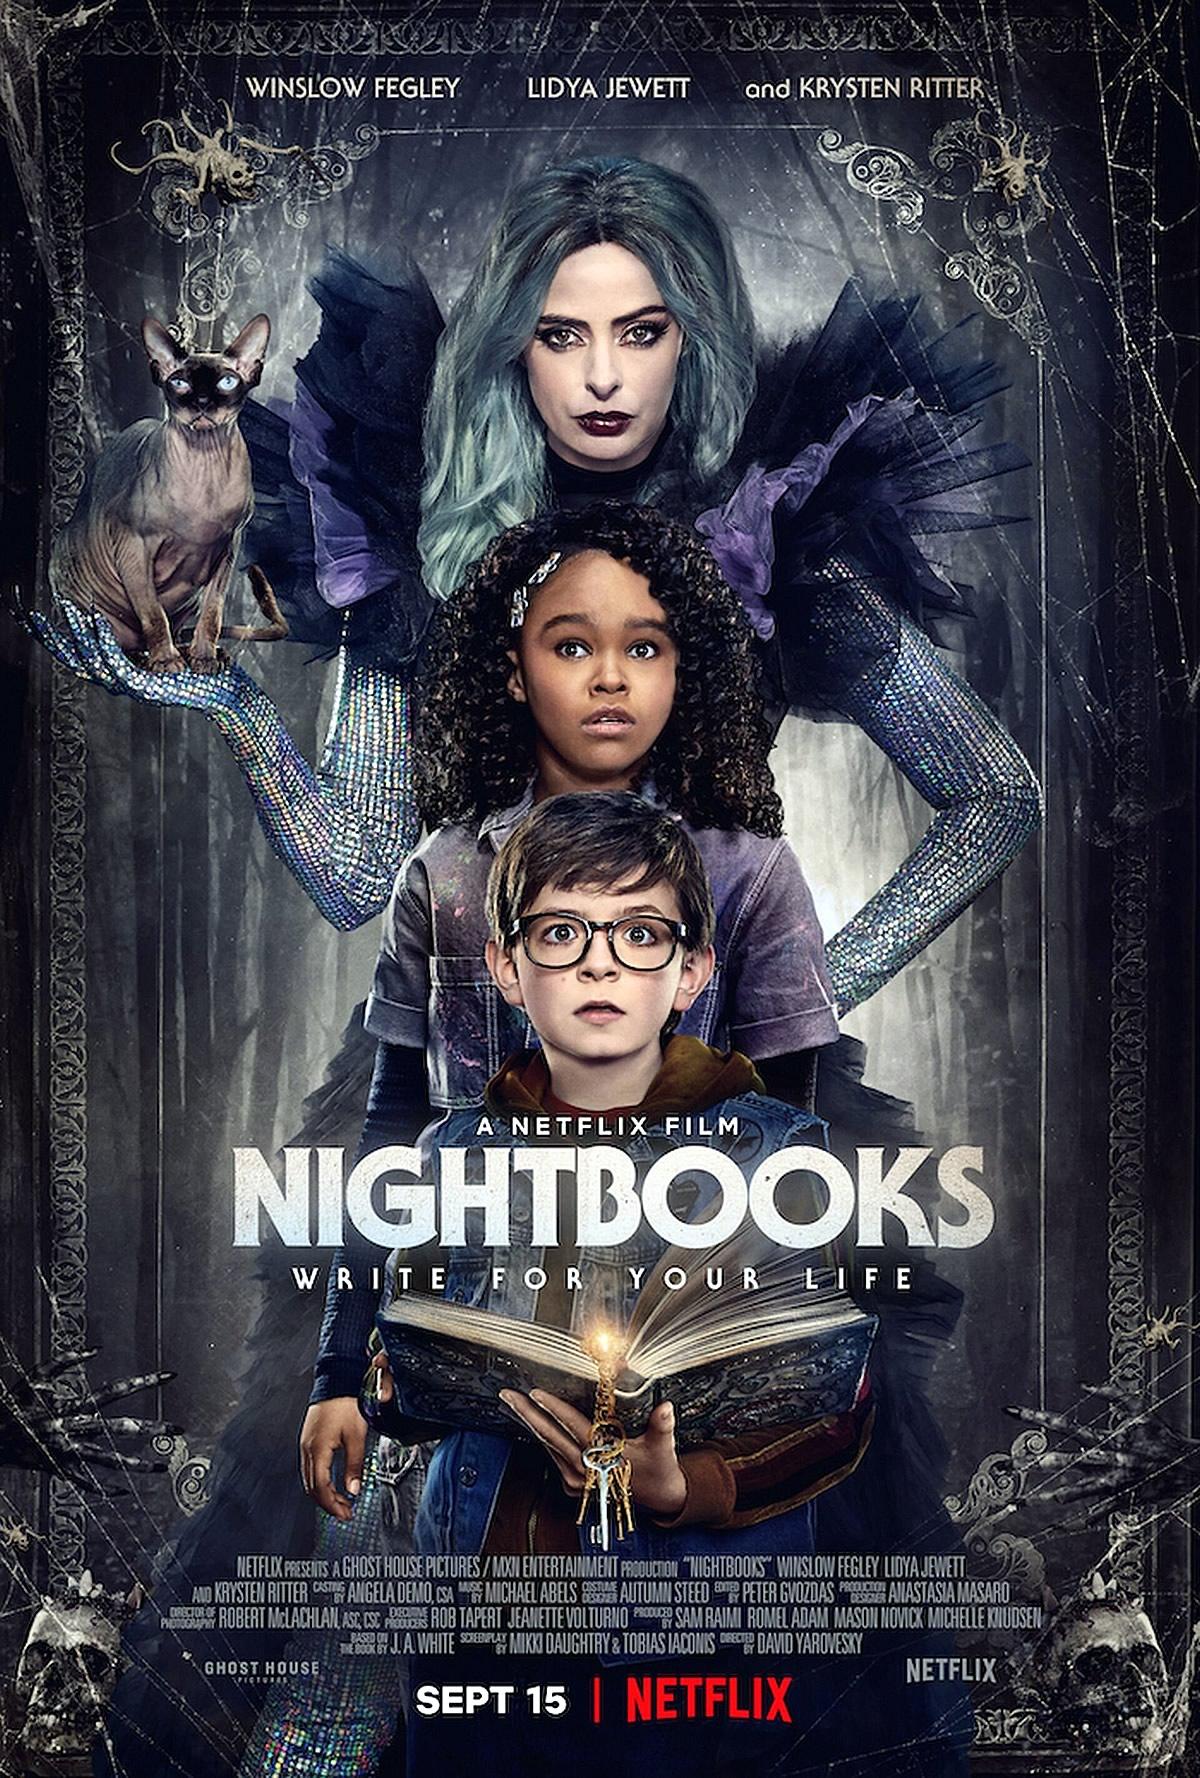 Nightbooks   Terror da Netflix com Krysten Ritter do produtor Sam Raimi tem trailer divulgado